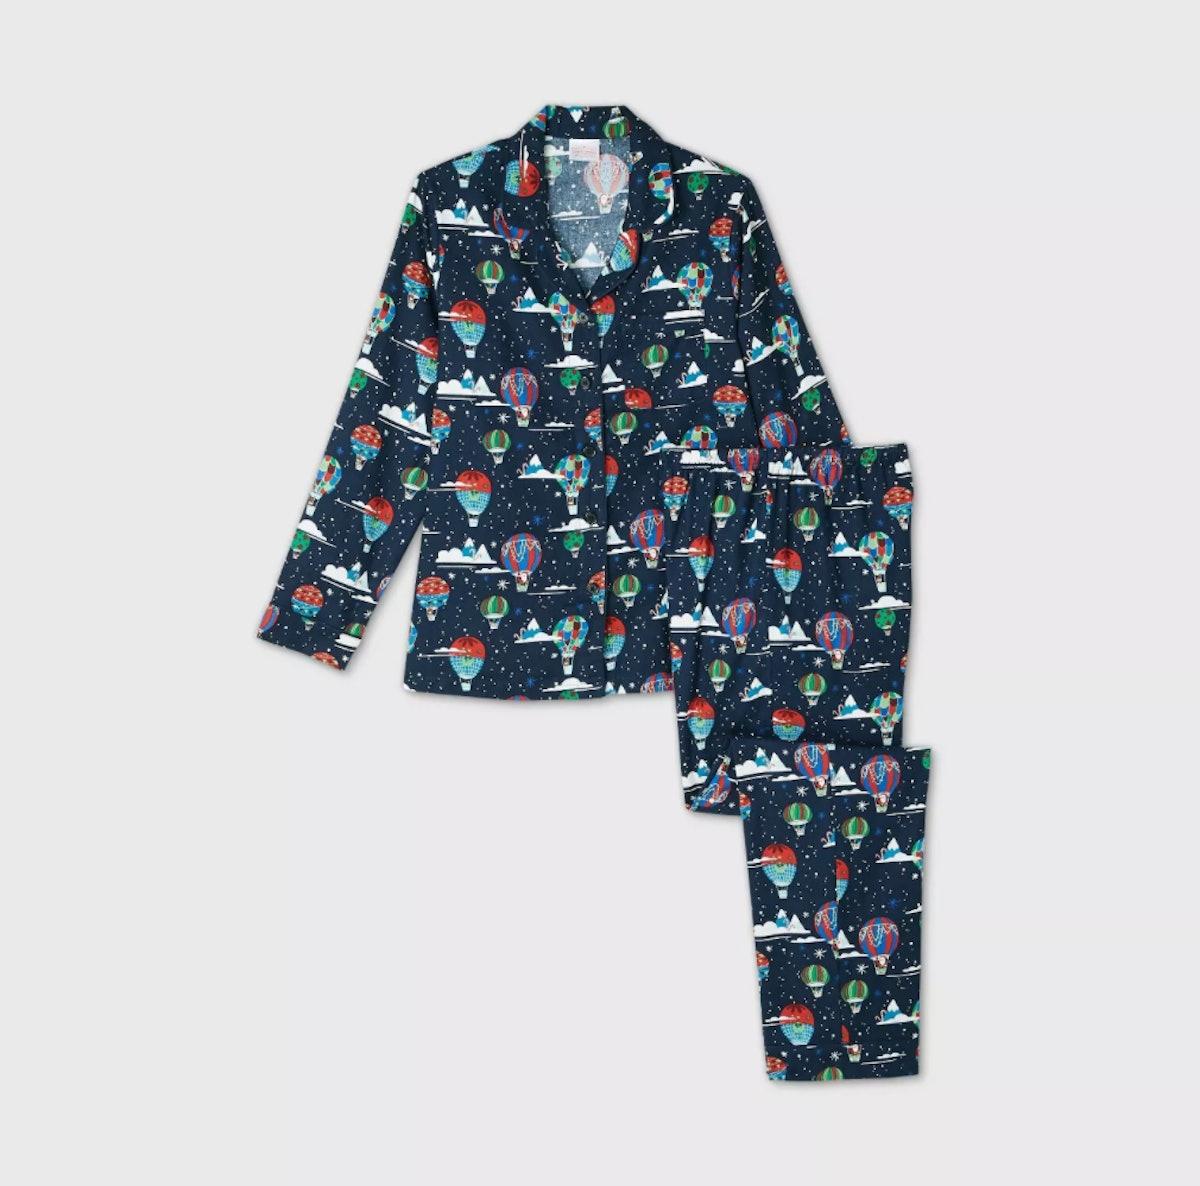 Women's Holiday Hot Air Balloon Print Flannel Matching Family Pajama Set - Wondershop™ Navy